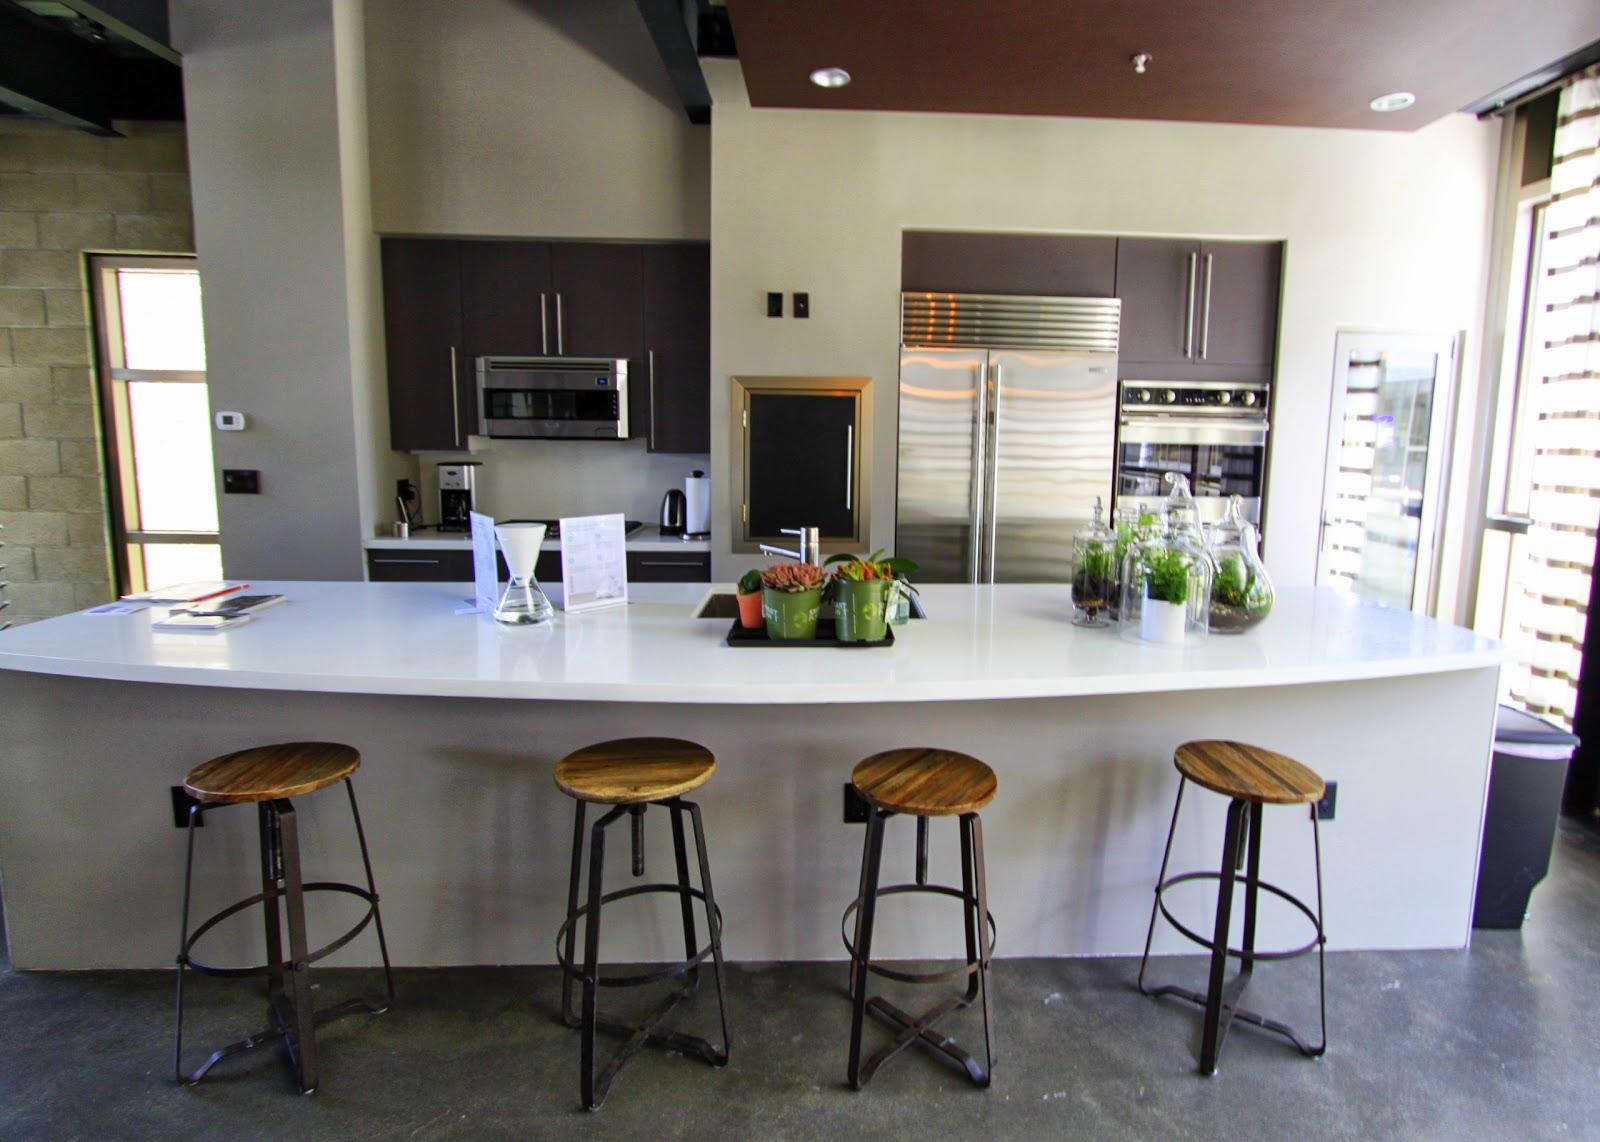 img 0815 jpg 1600 1142 townhouse kitchen reno ideas pinterest